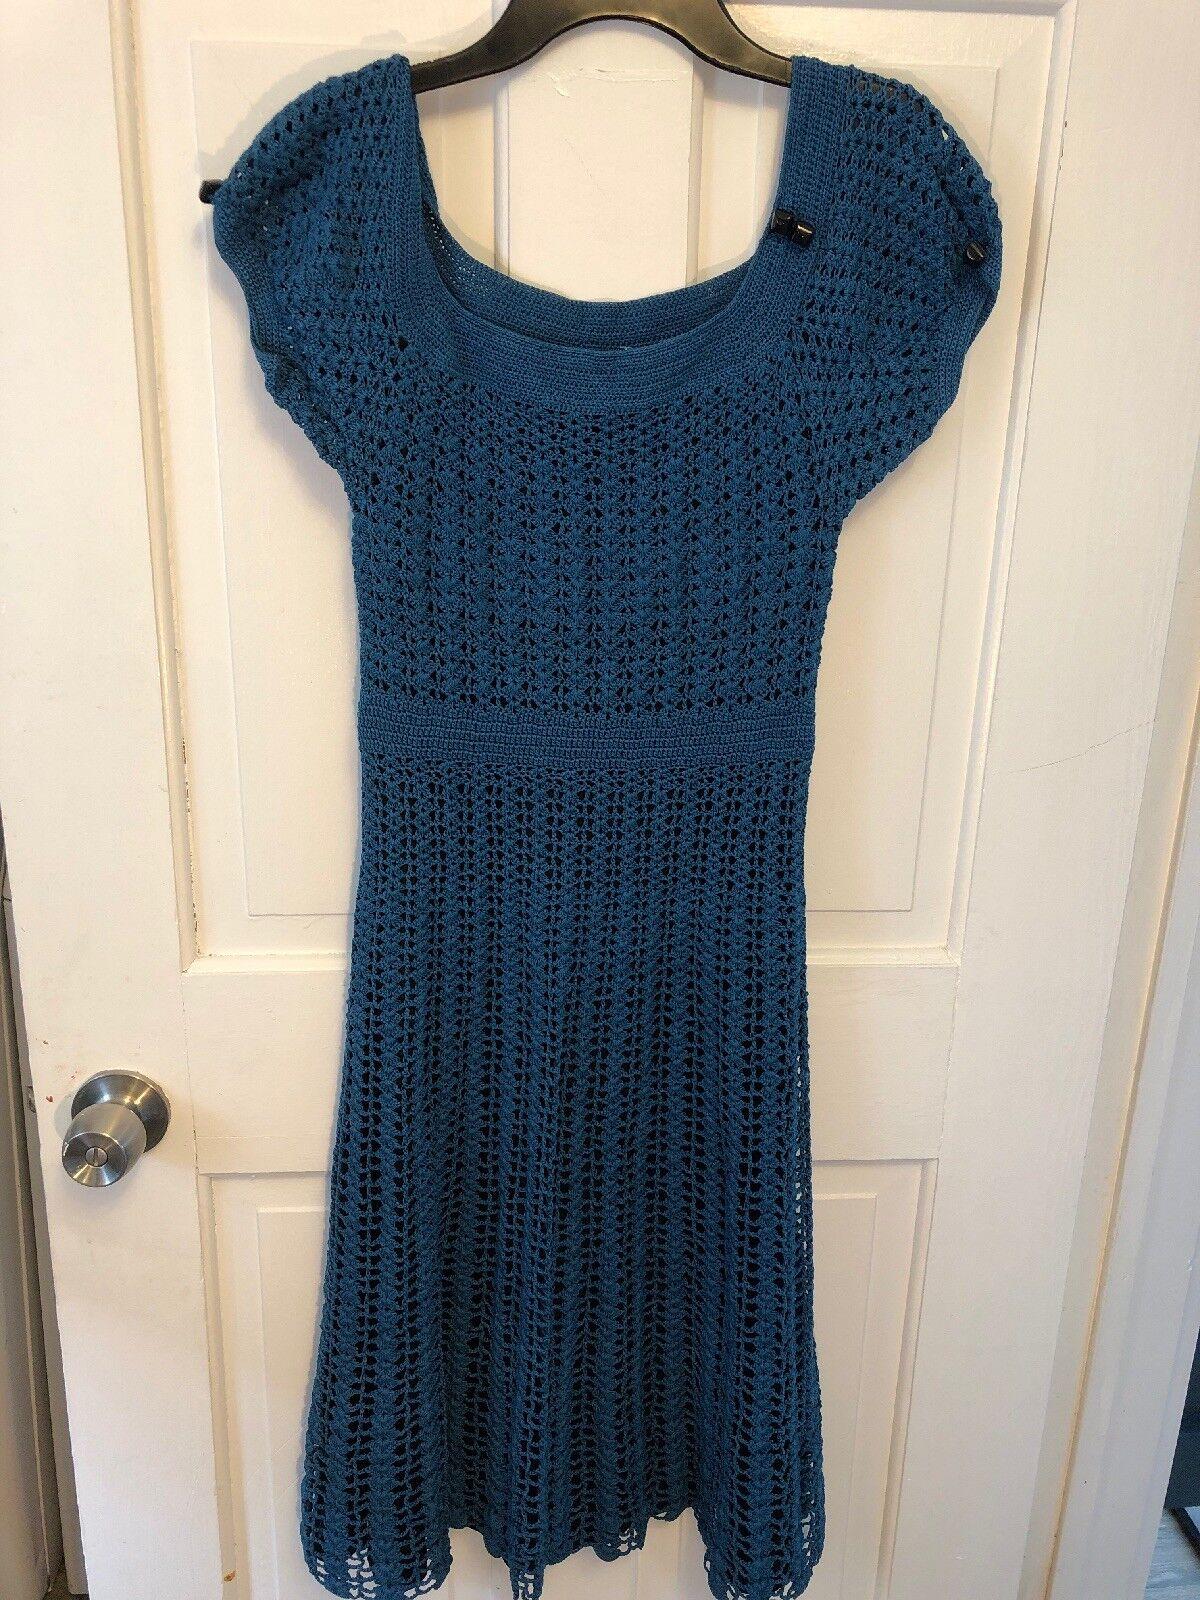 BETSEY JOHNSON NEW YORK Teal Blau Crochet Cap Sleeve Long Dress M Runs Small